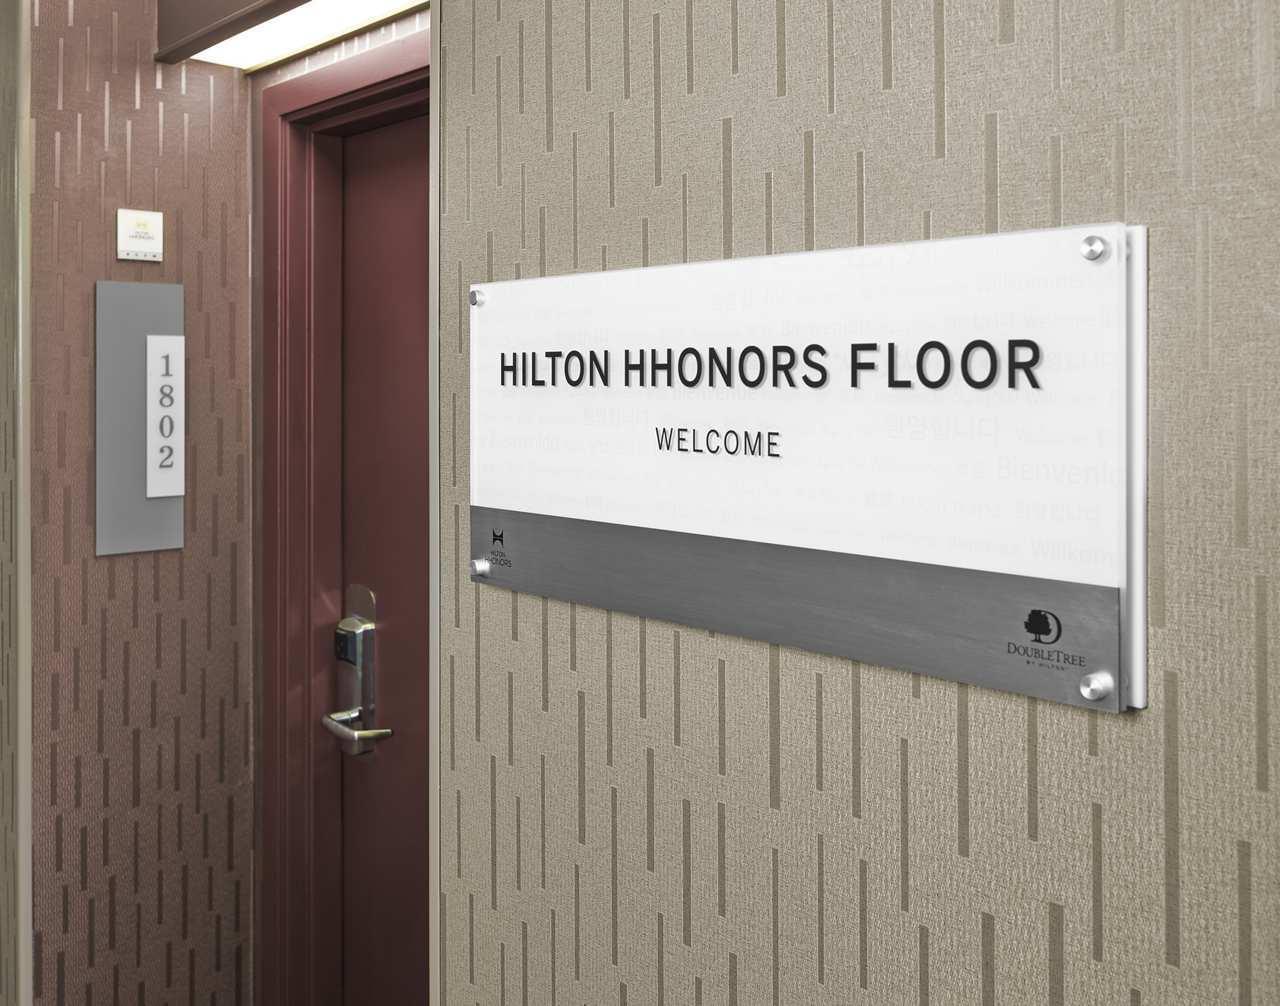 DoubleTree by Hilton Hotel West Edmonton in Edmonton: Hilton Honors Floor